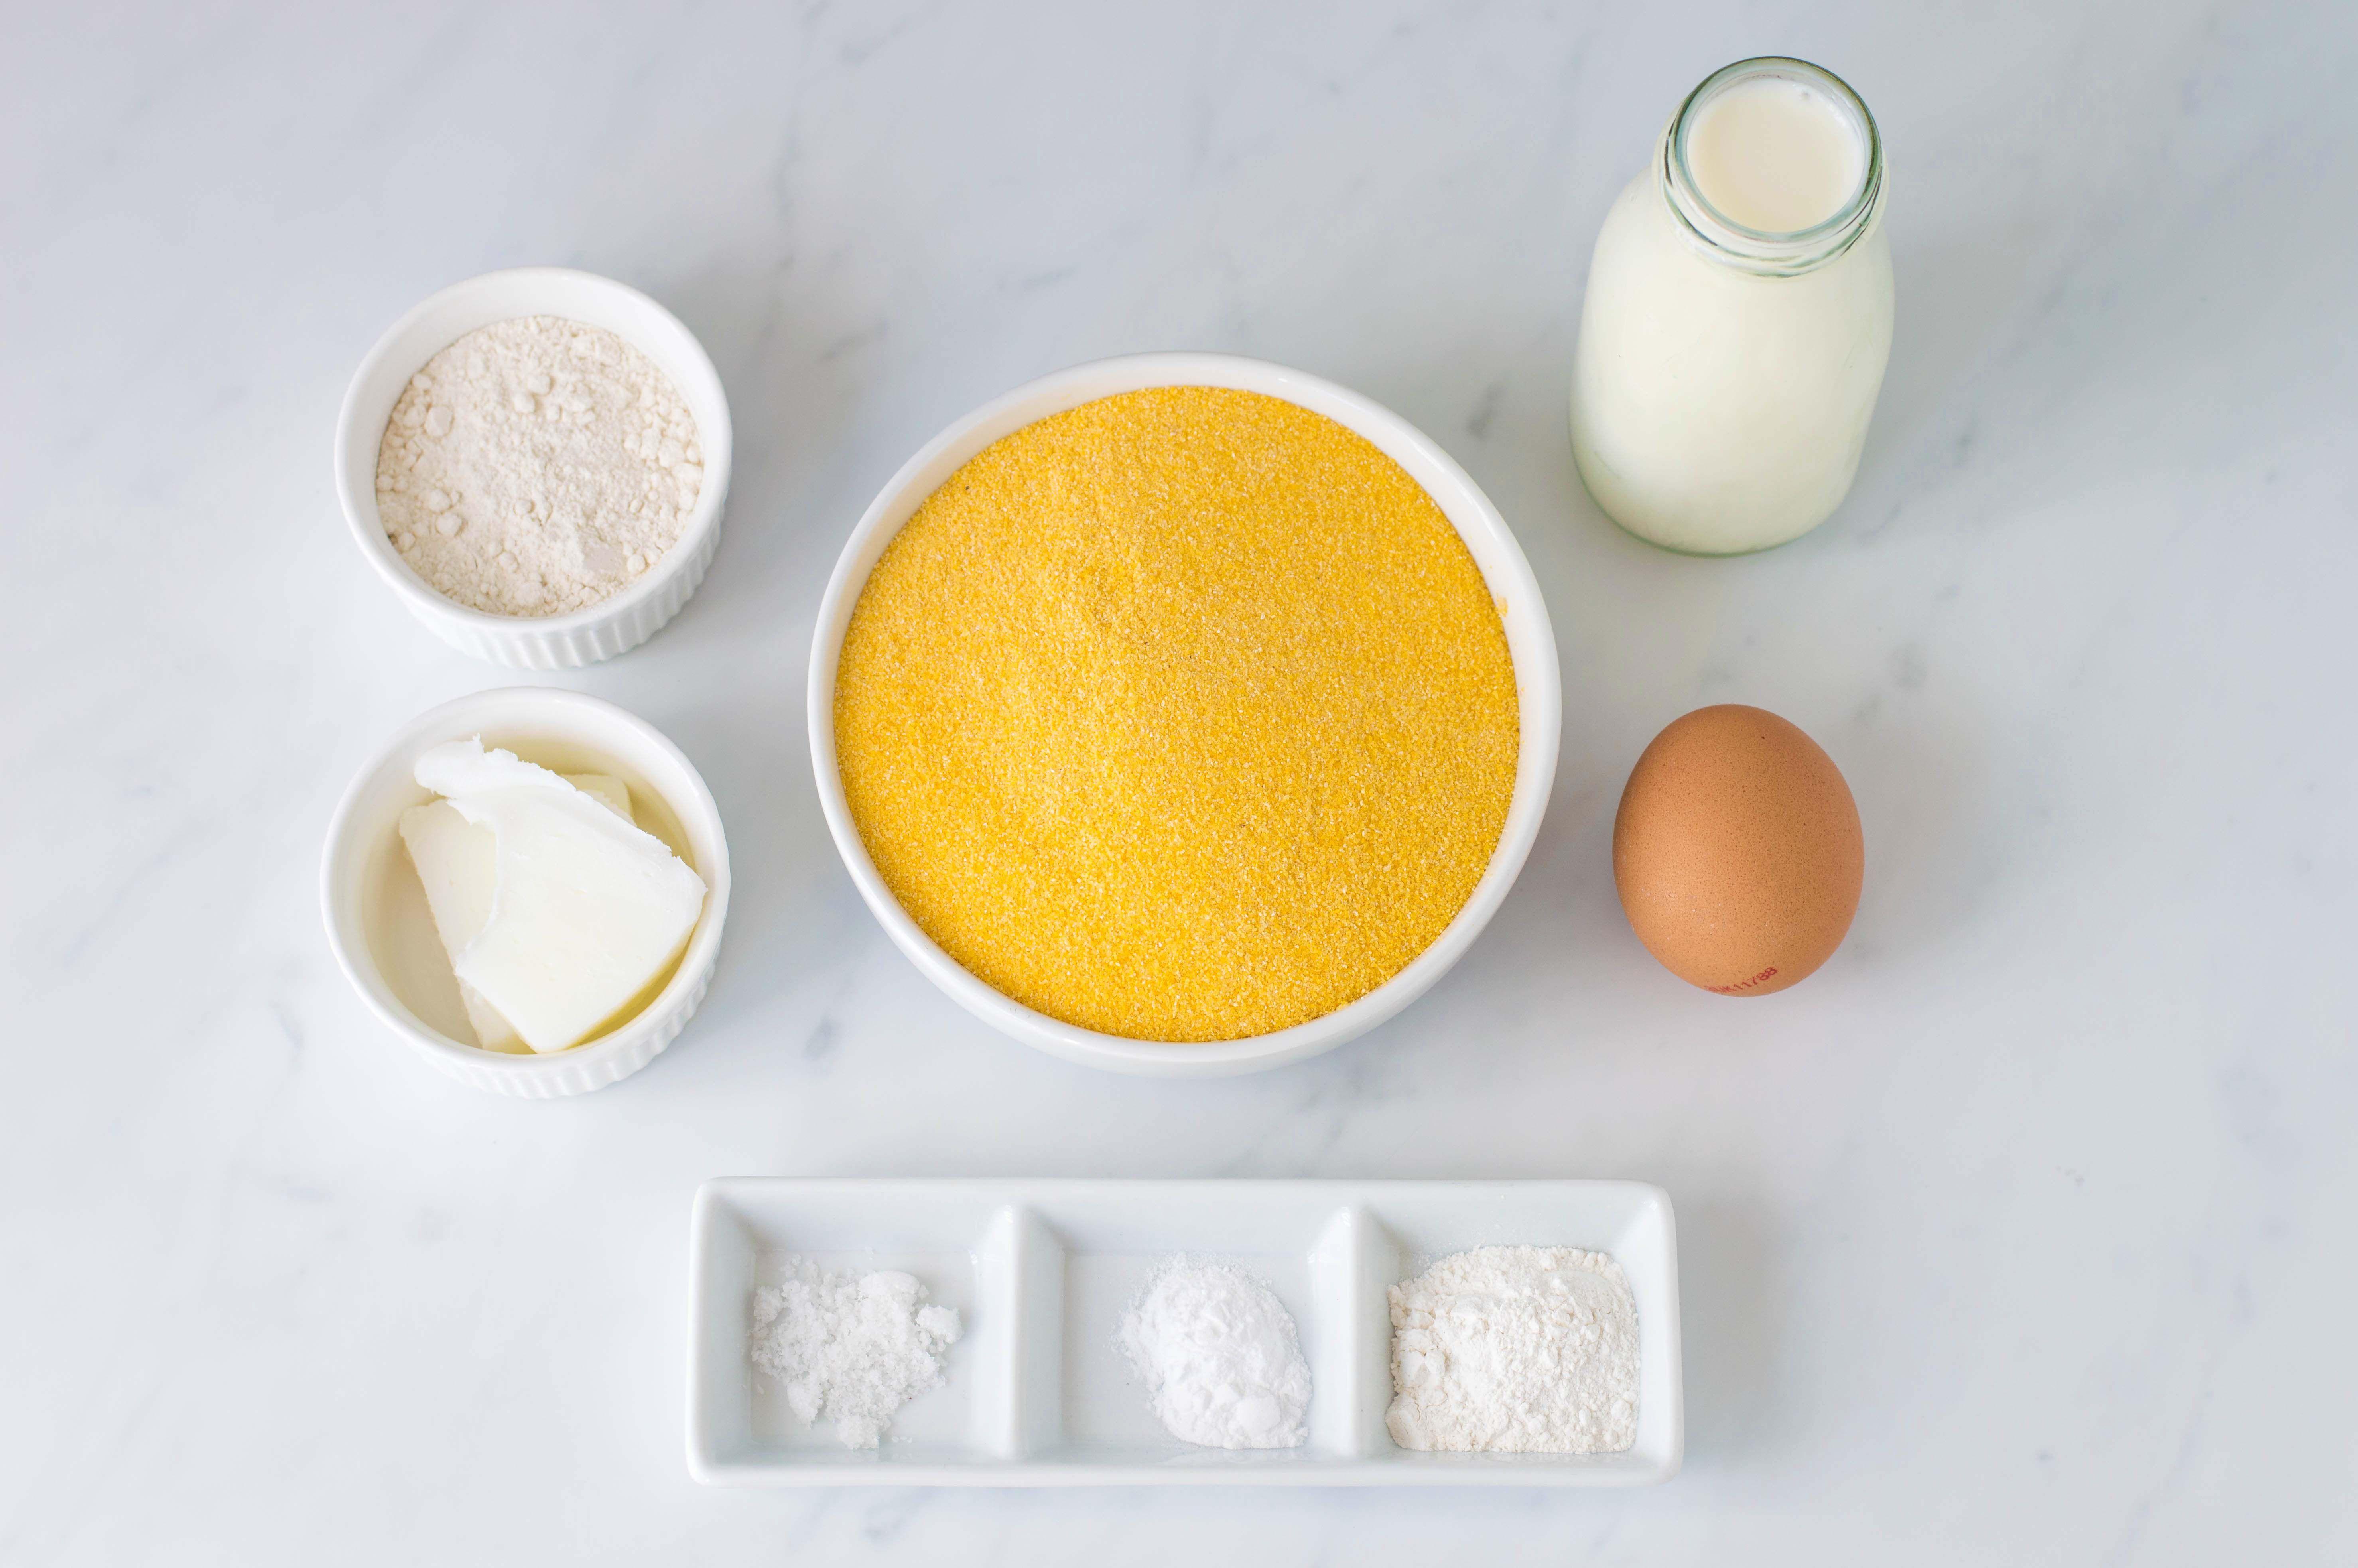 Southern Buttermilk Cornbread Recipe ingredients